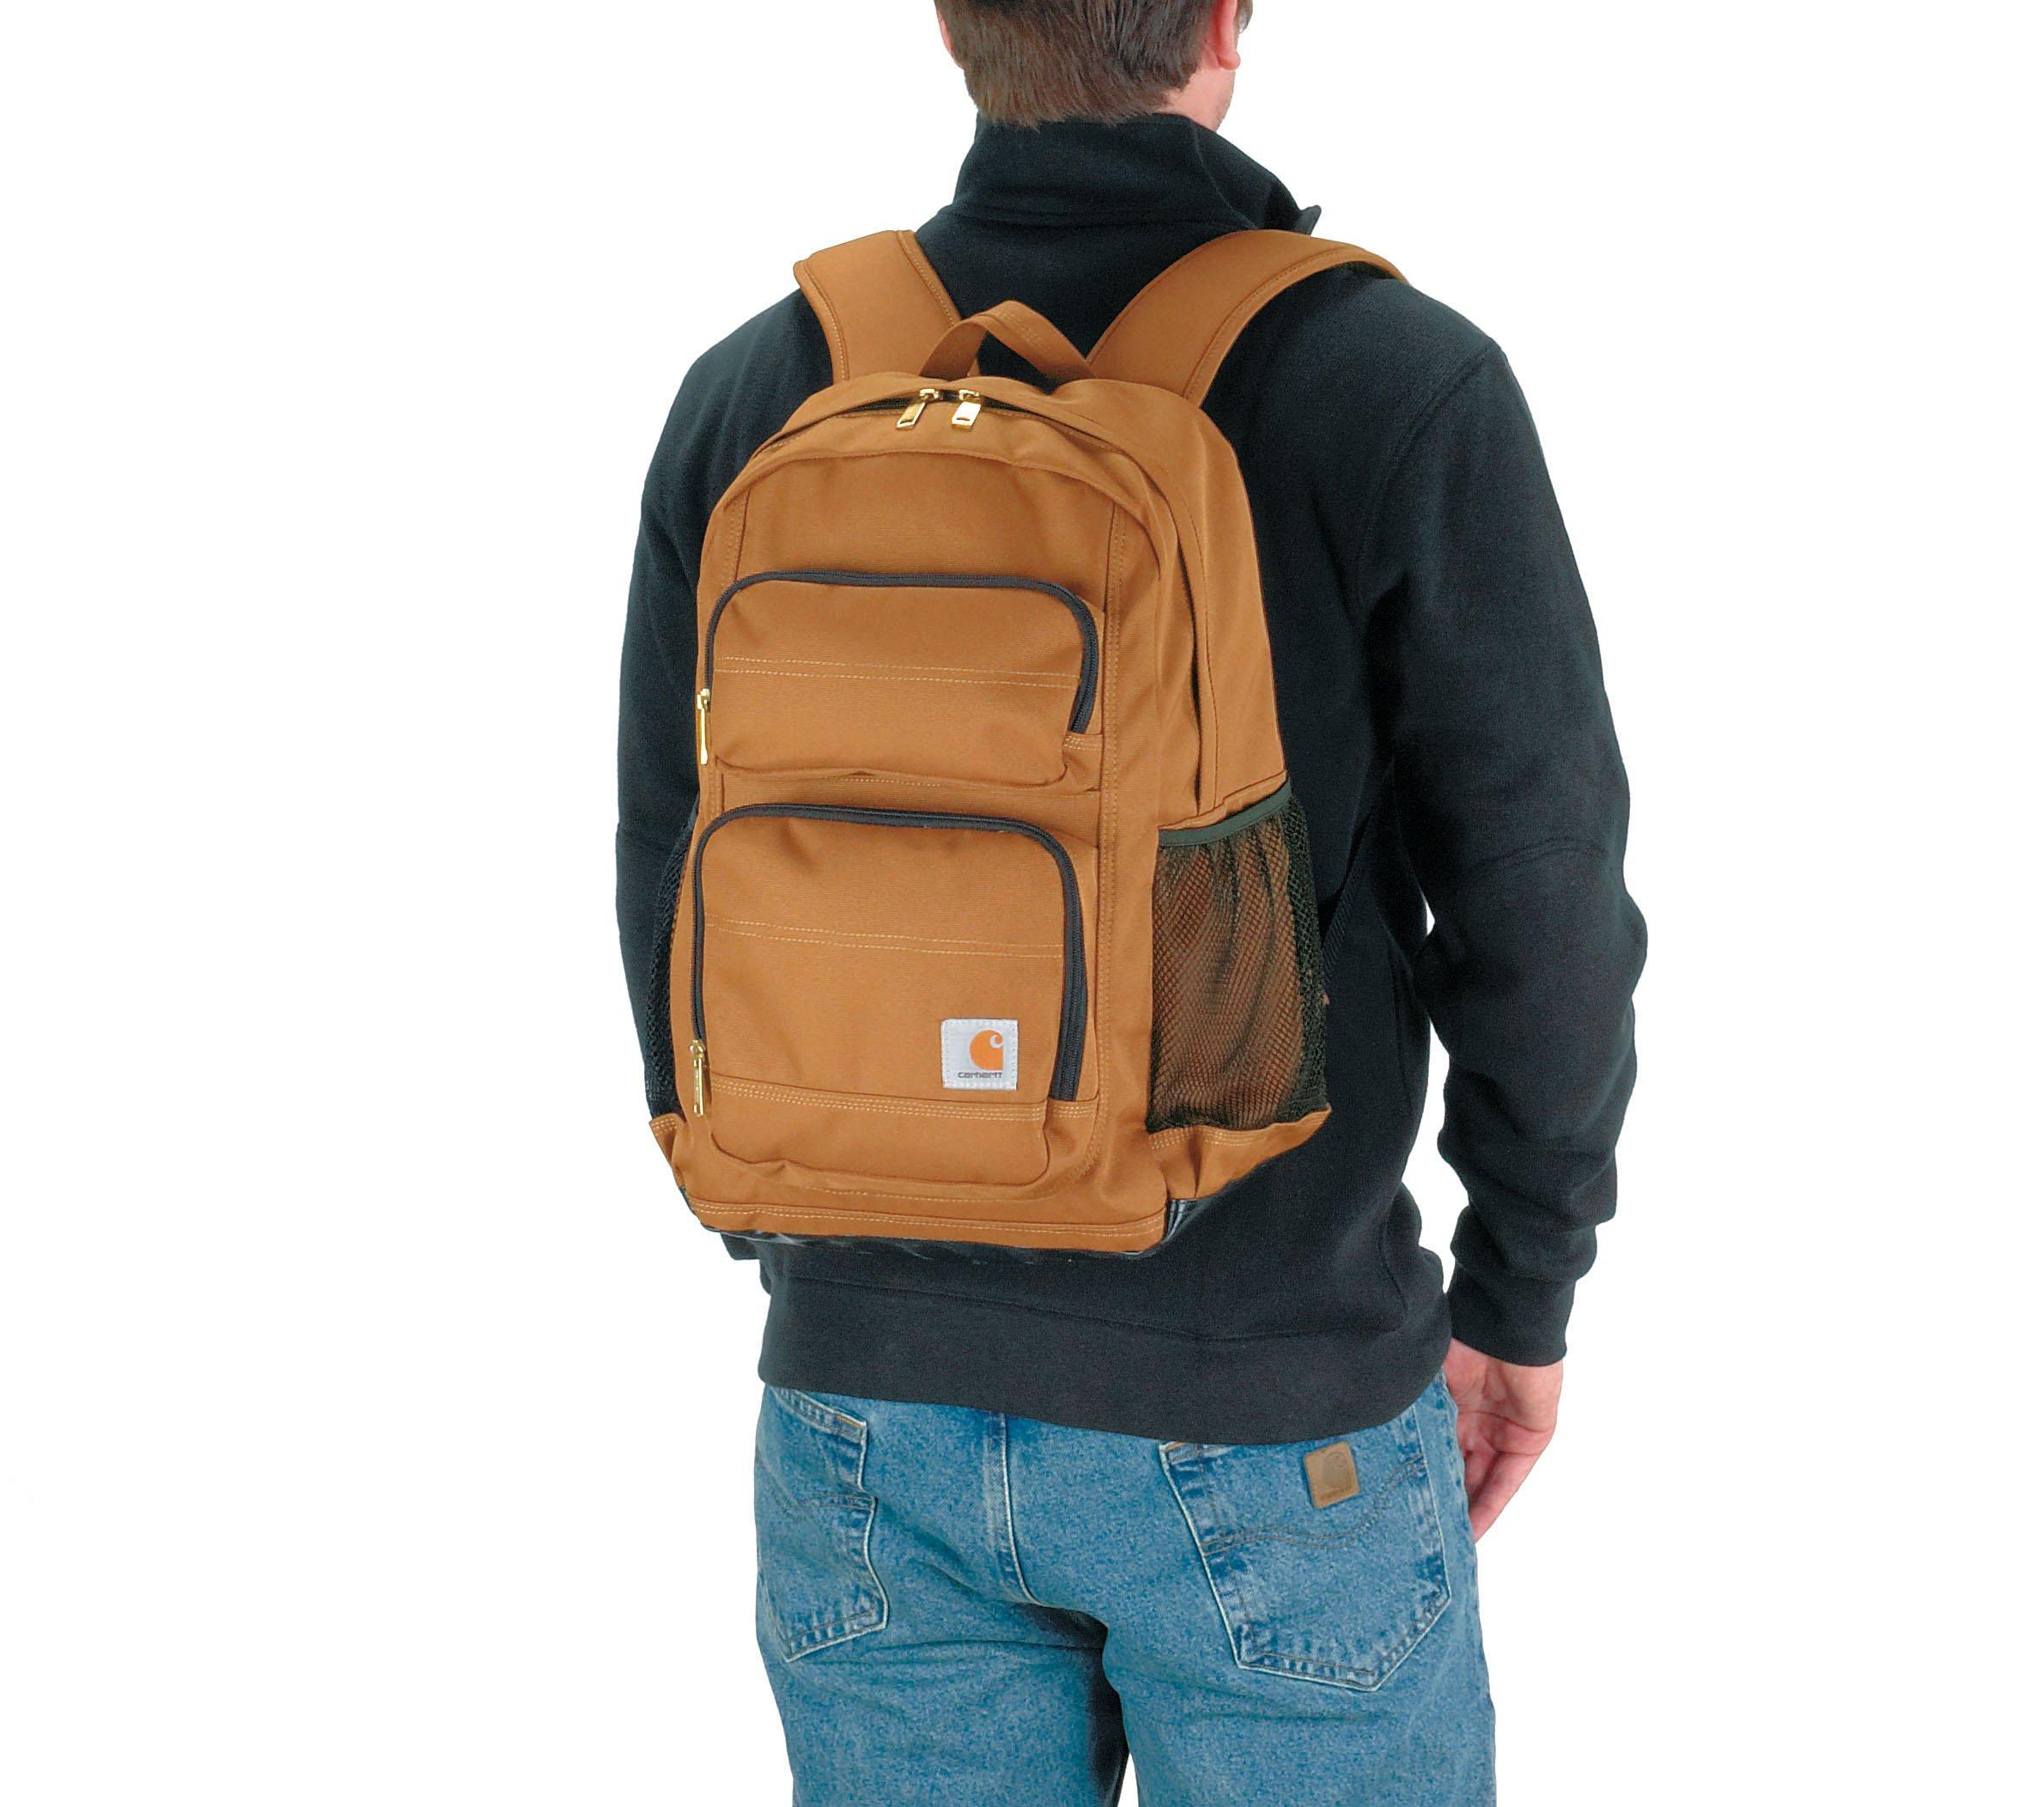 746686d69 Amazon.com: Carhartt: Backpacks